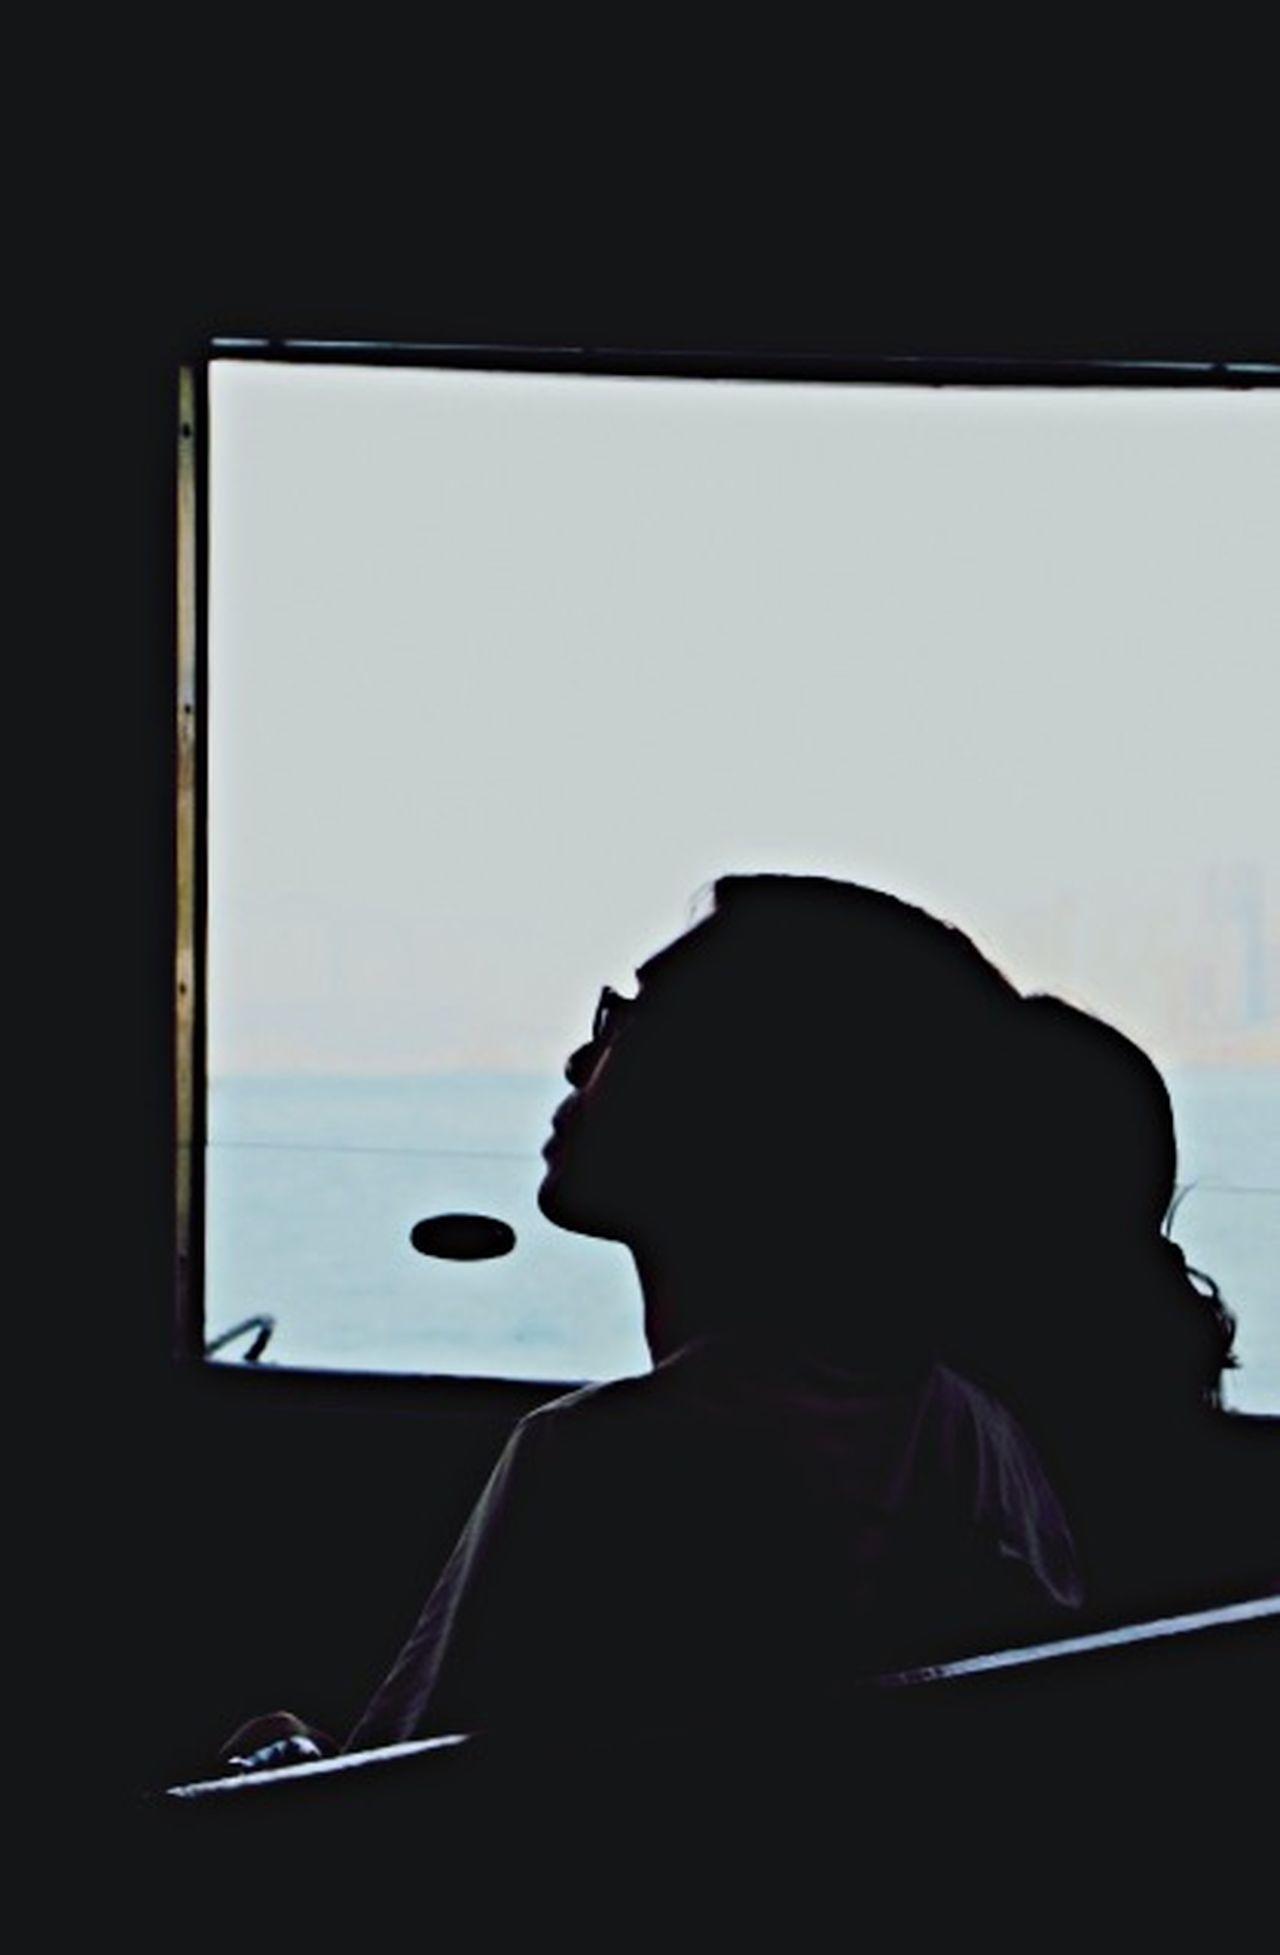 Window Seat Window To The World Starting A Trip Staring People Watching Silouhettes Couple Gazing Sea View